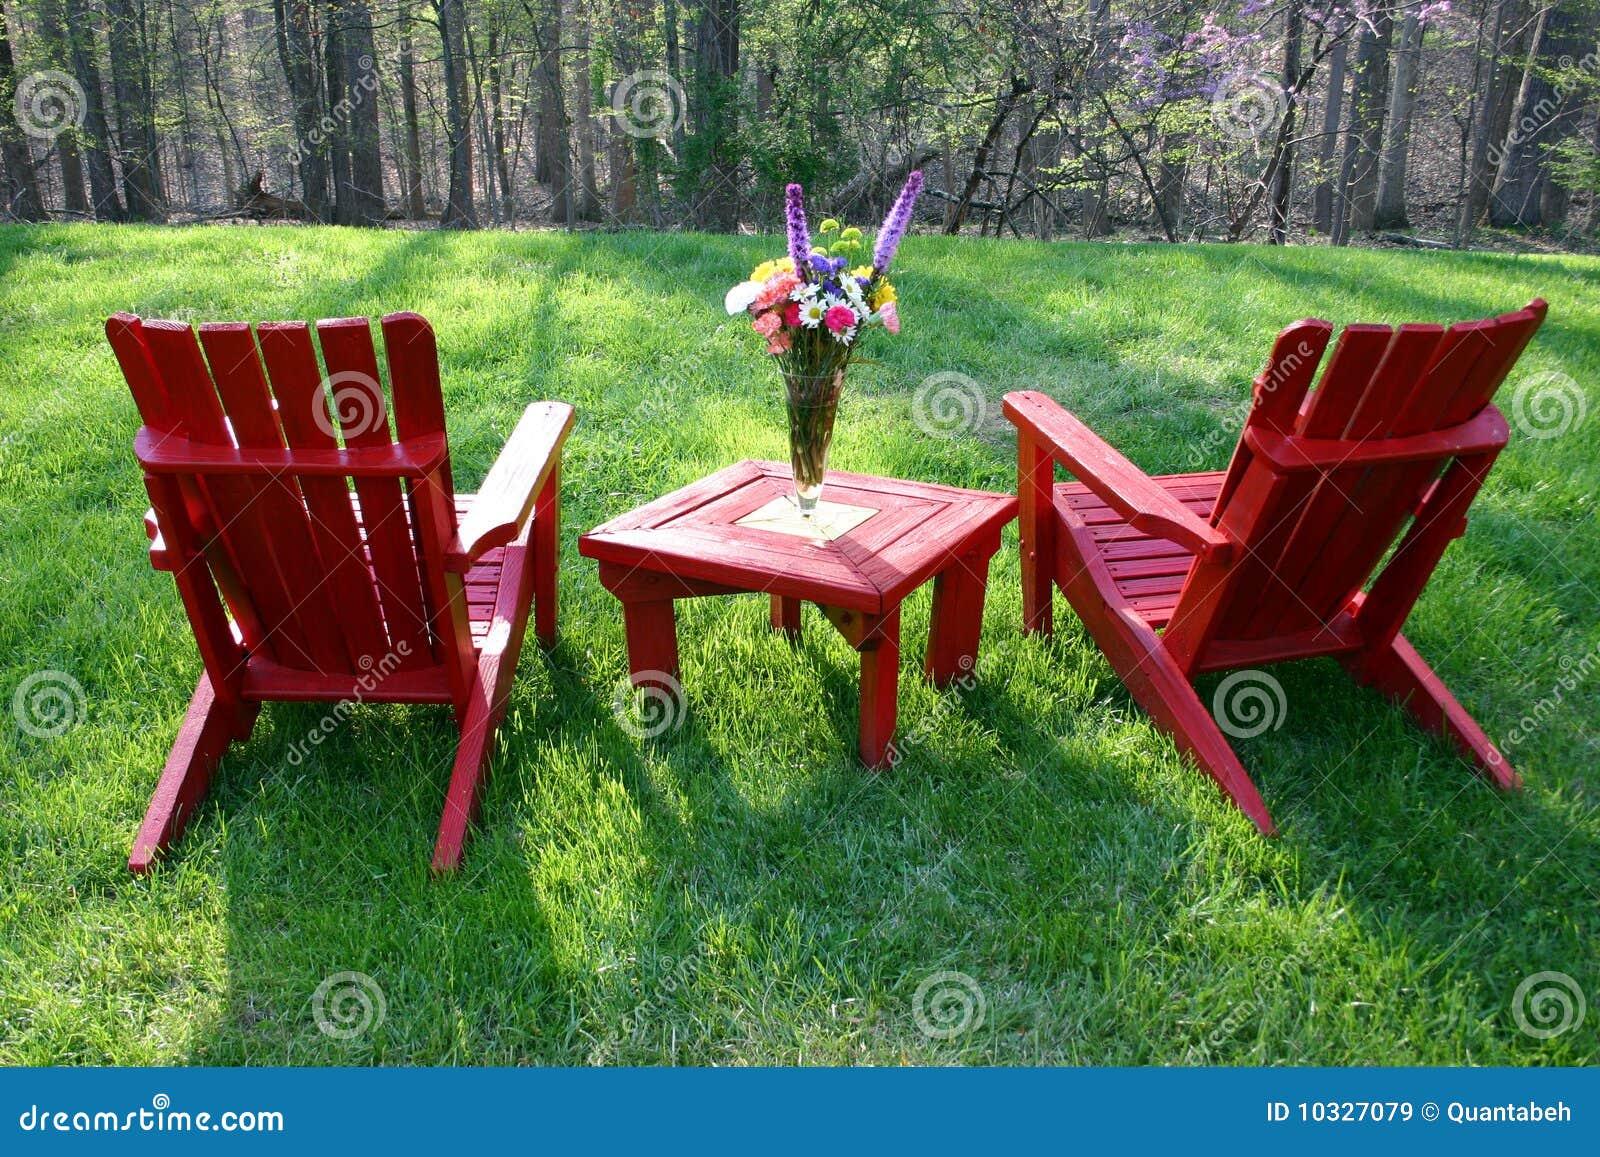 Backyard Furniture Stock Image. Image Of Furniture